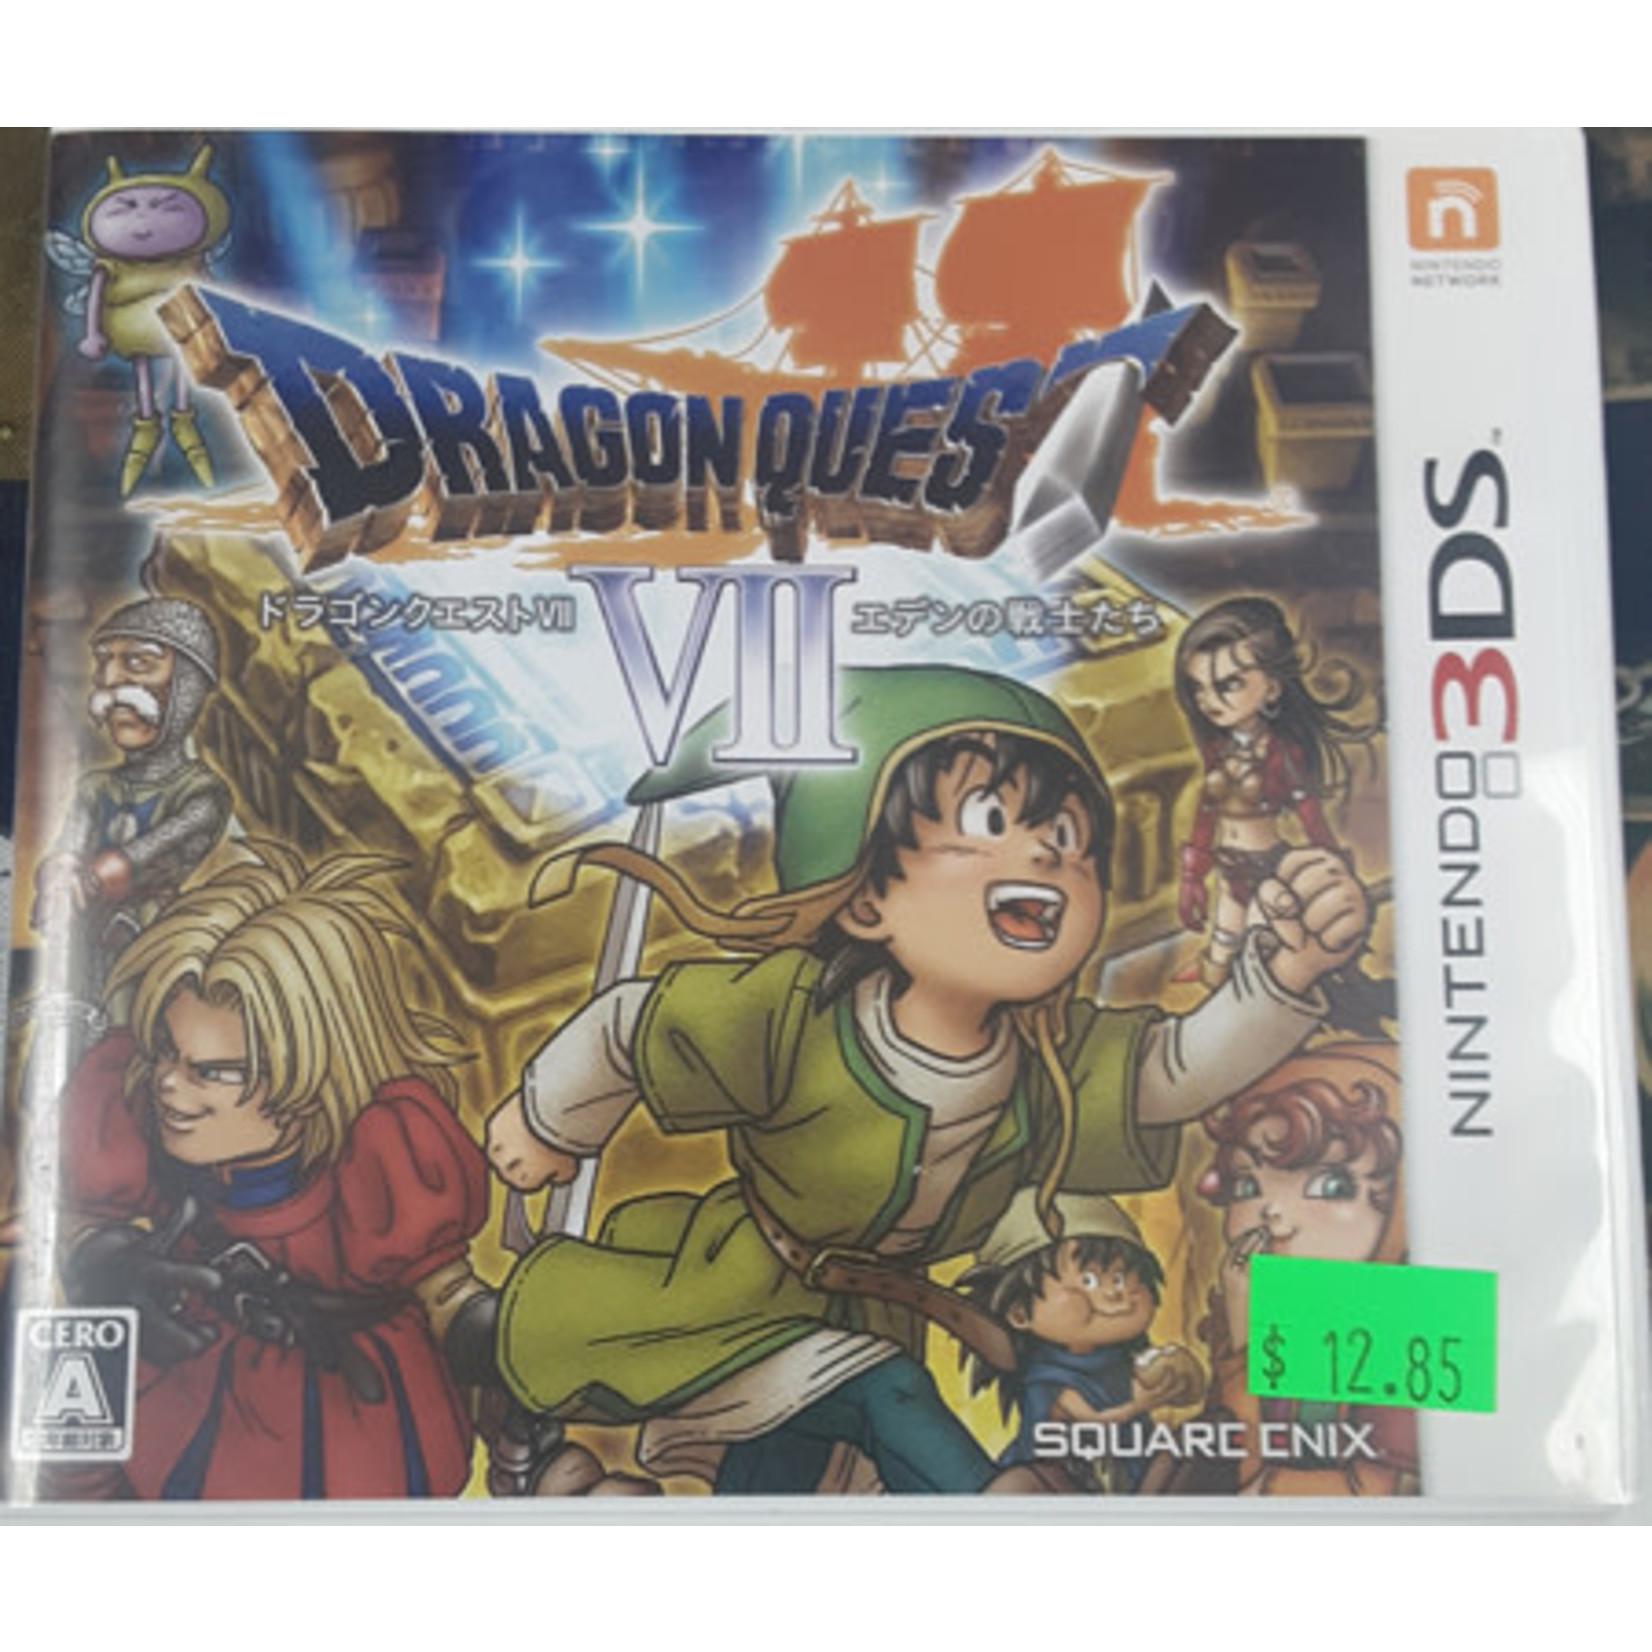 IMPORT-3DSU-Dragon Quest VII